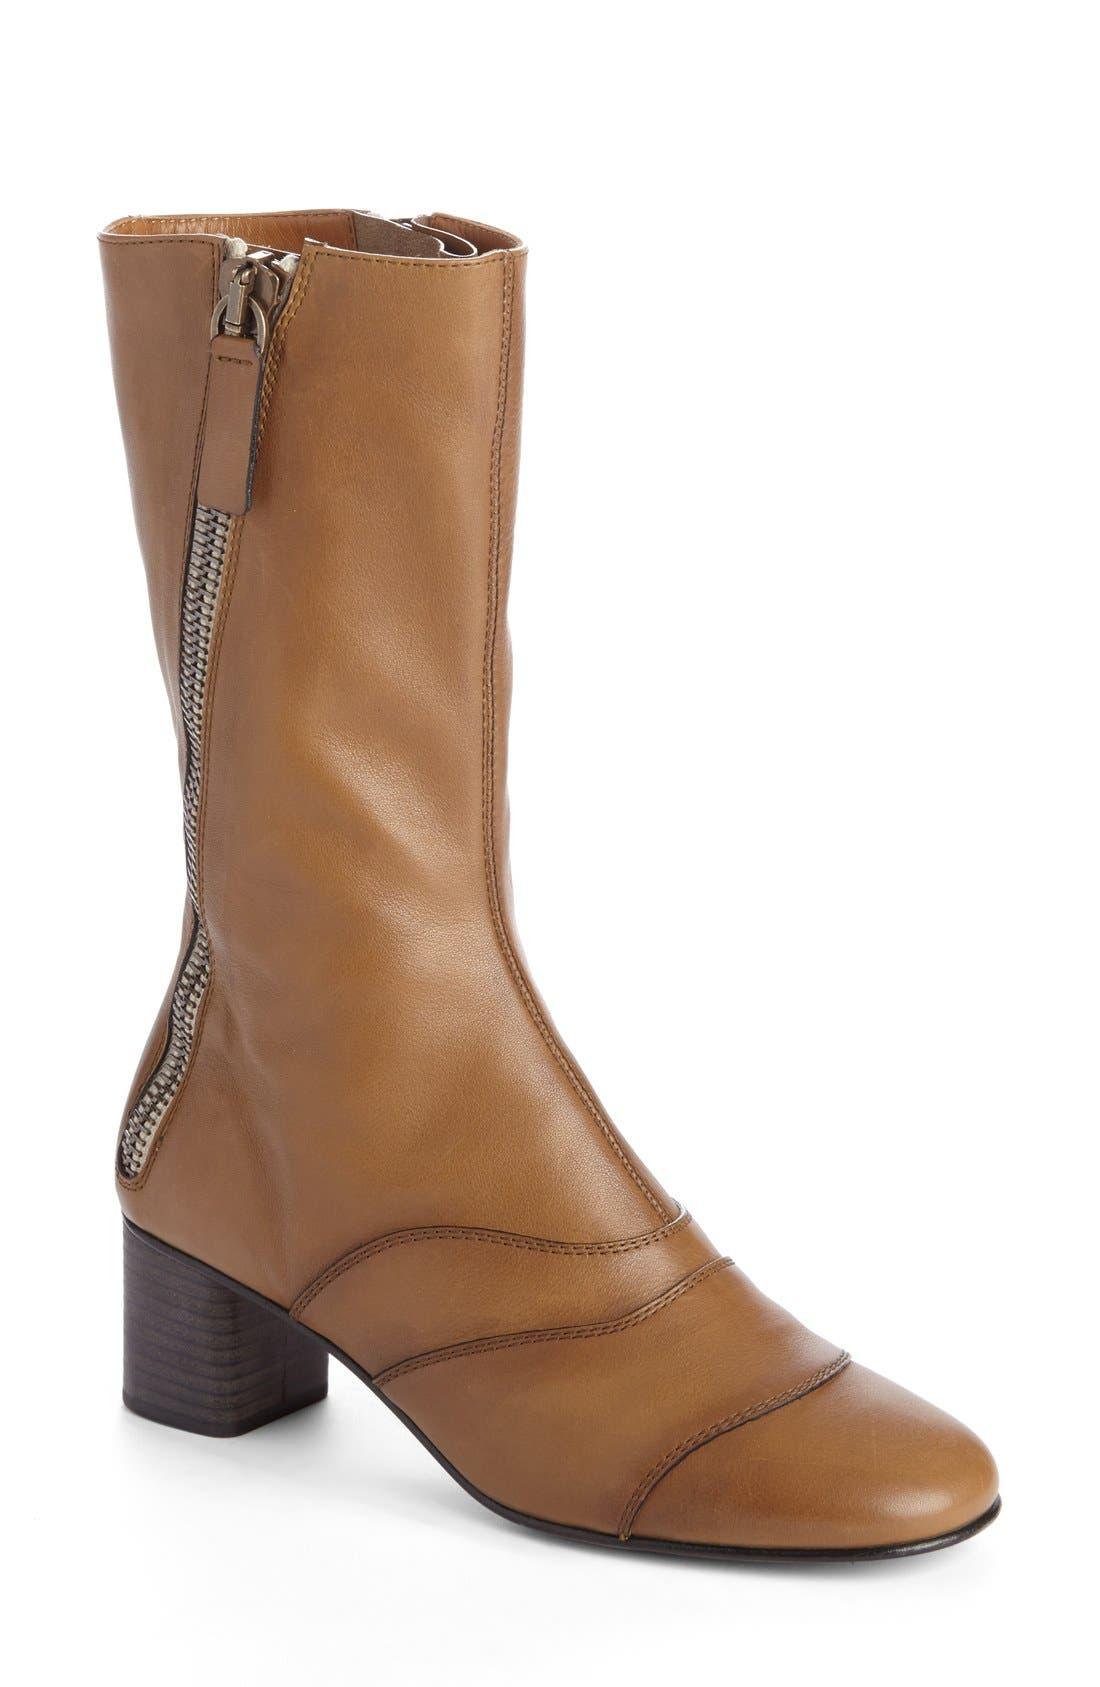 Alternate Image 1 Selected - Chloé 'Lexie' Block Heel Boot (Women)